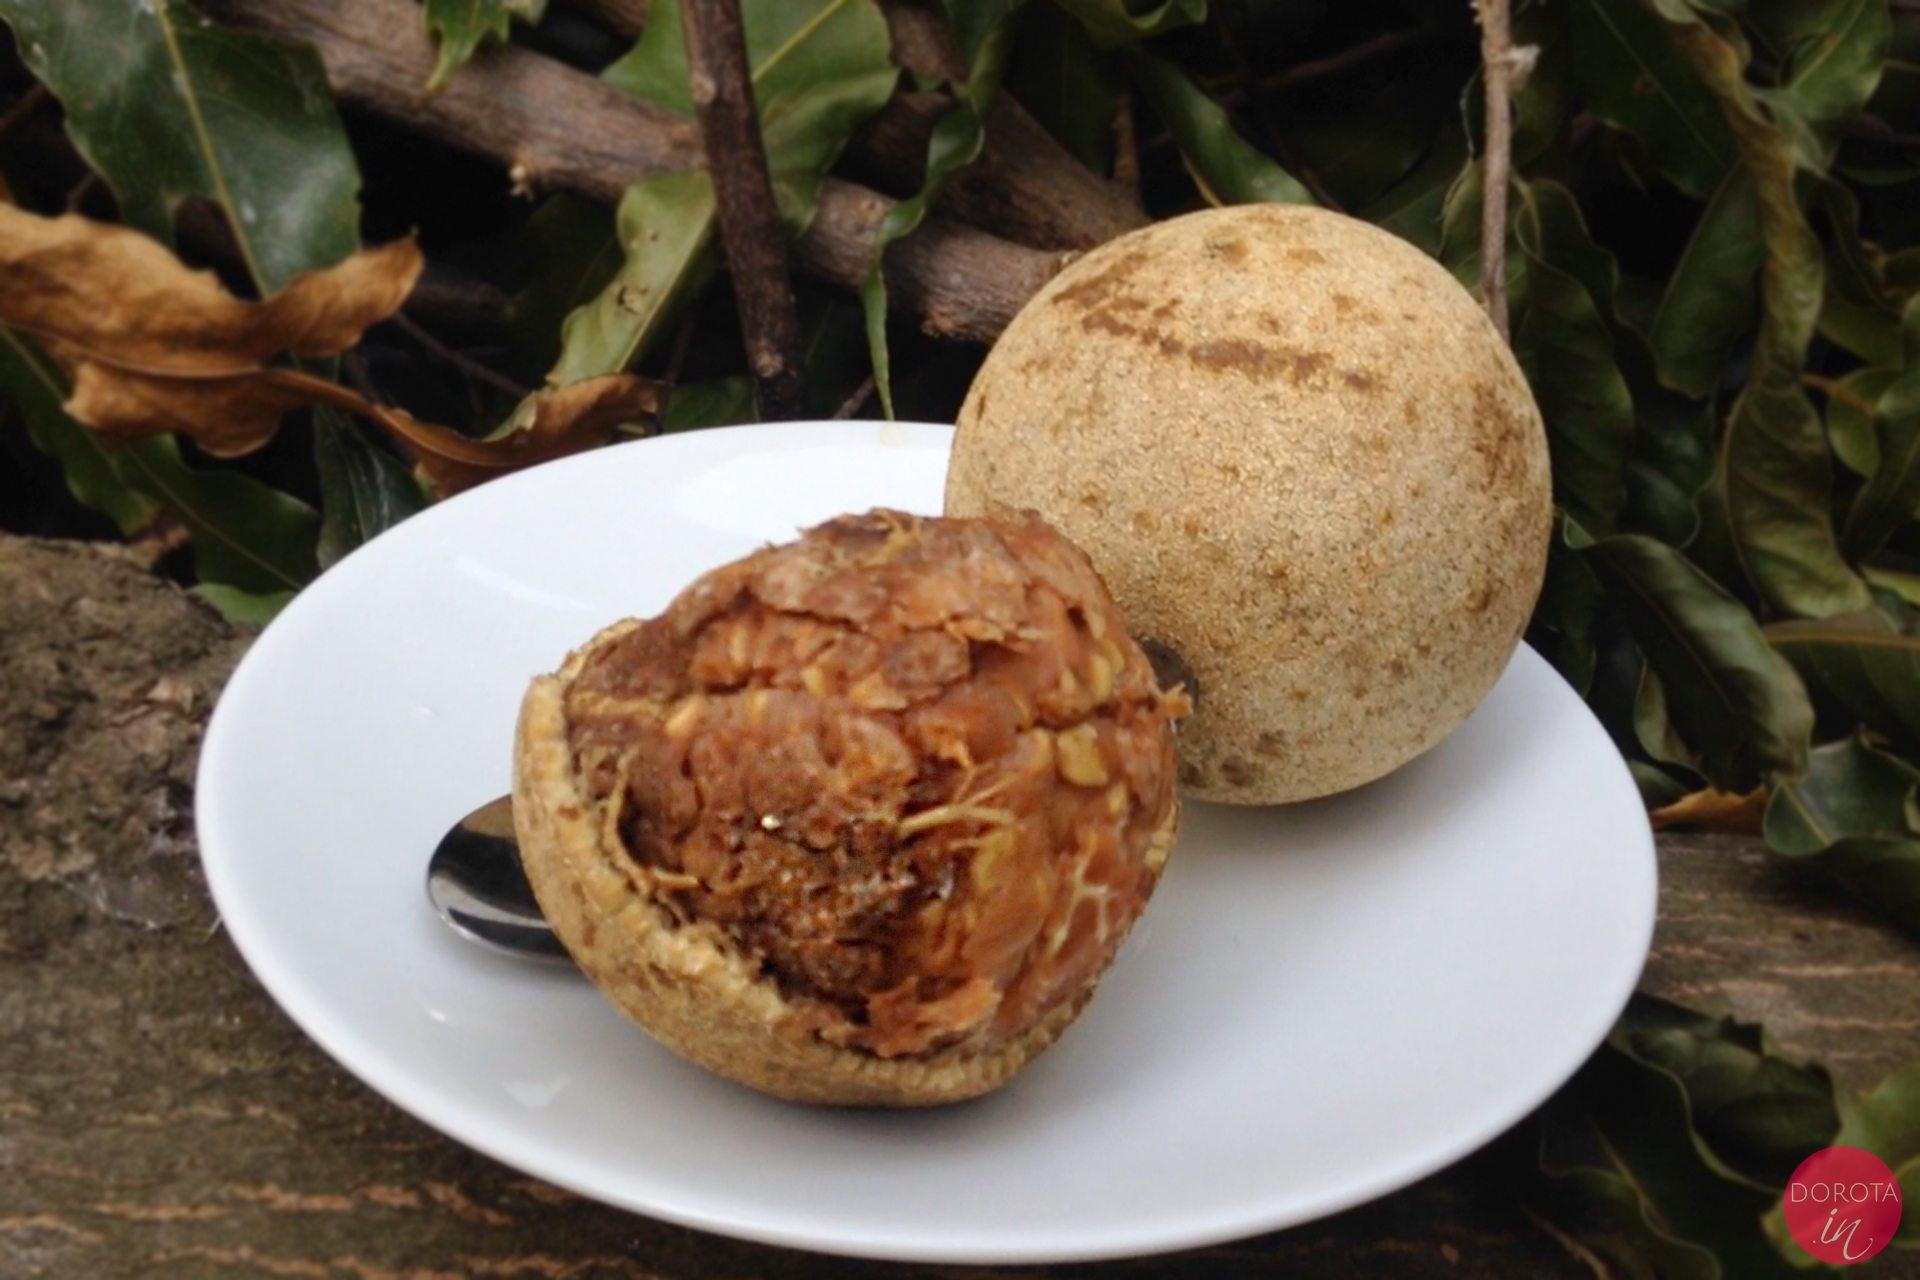 Feronia słoniowa - woodapple